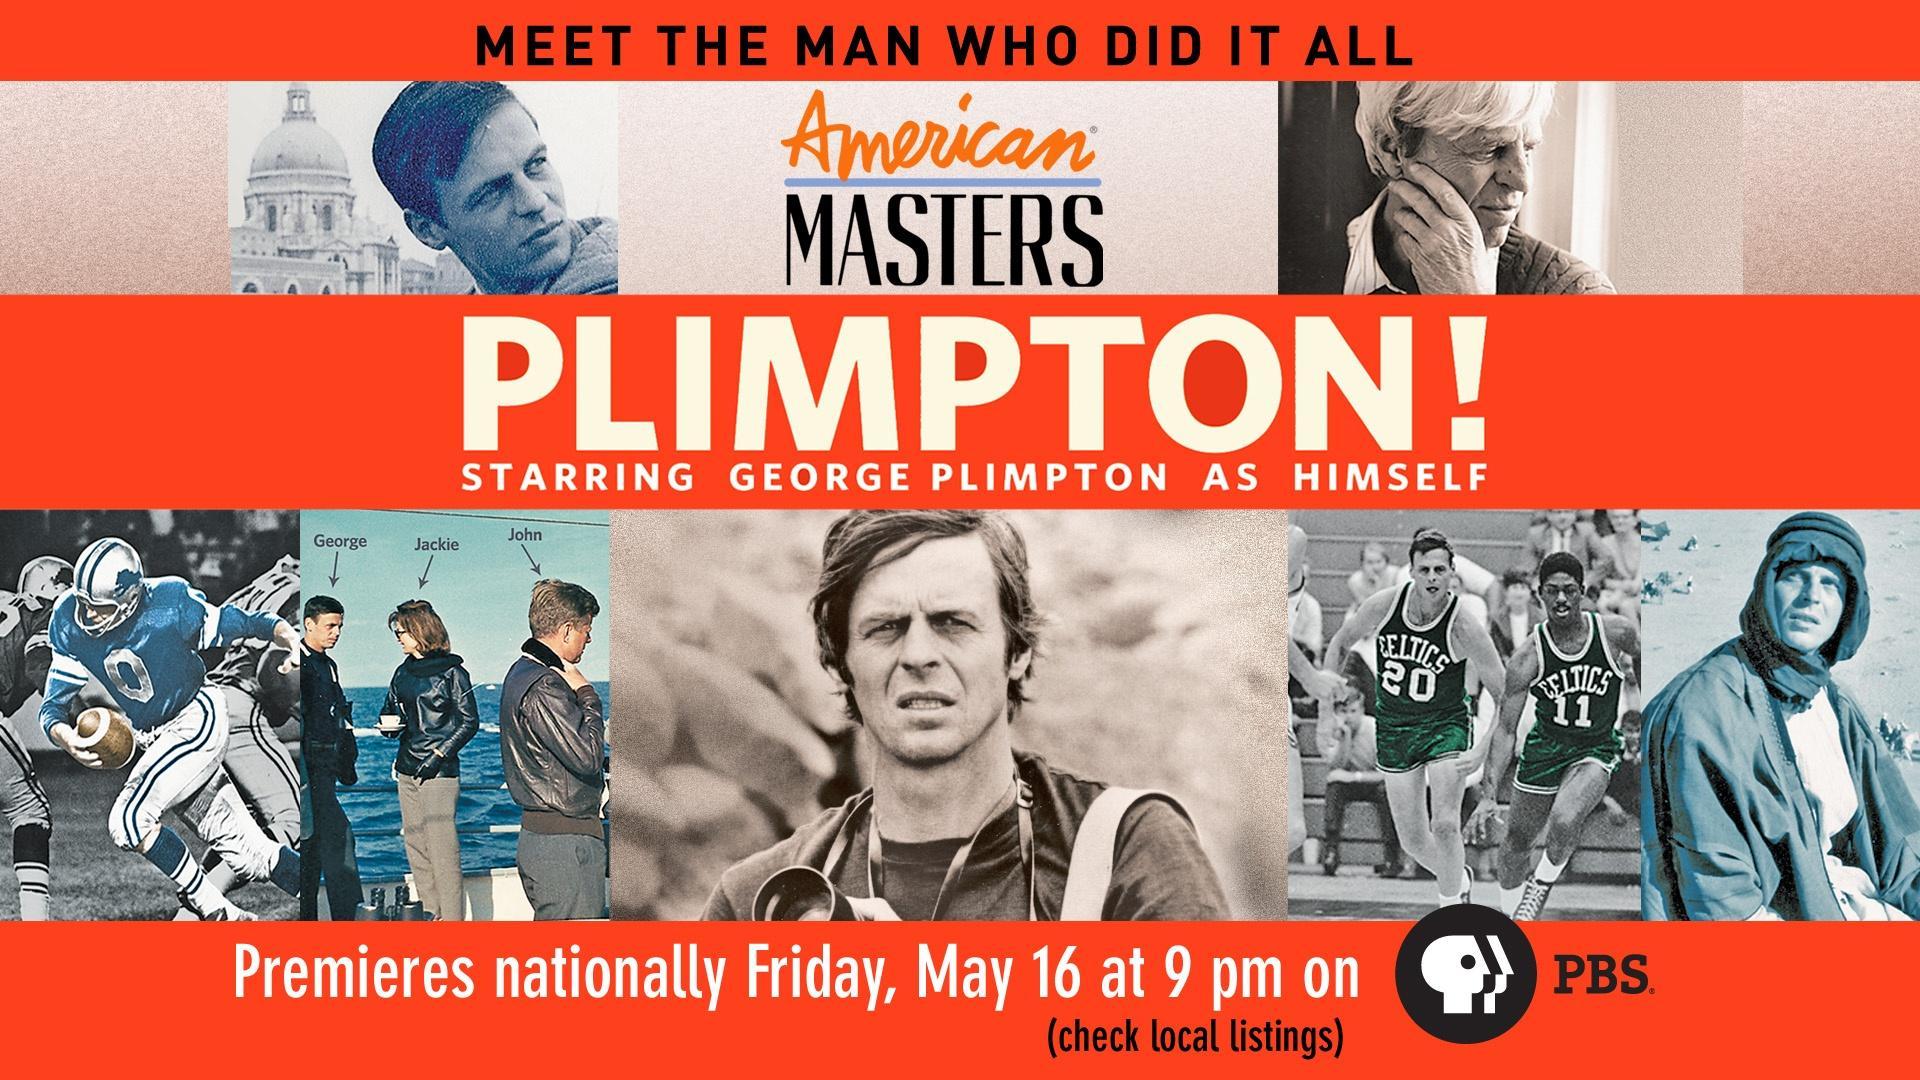 Plimpton! Starring George Plimpton as Himself - Full Film image